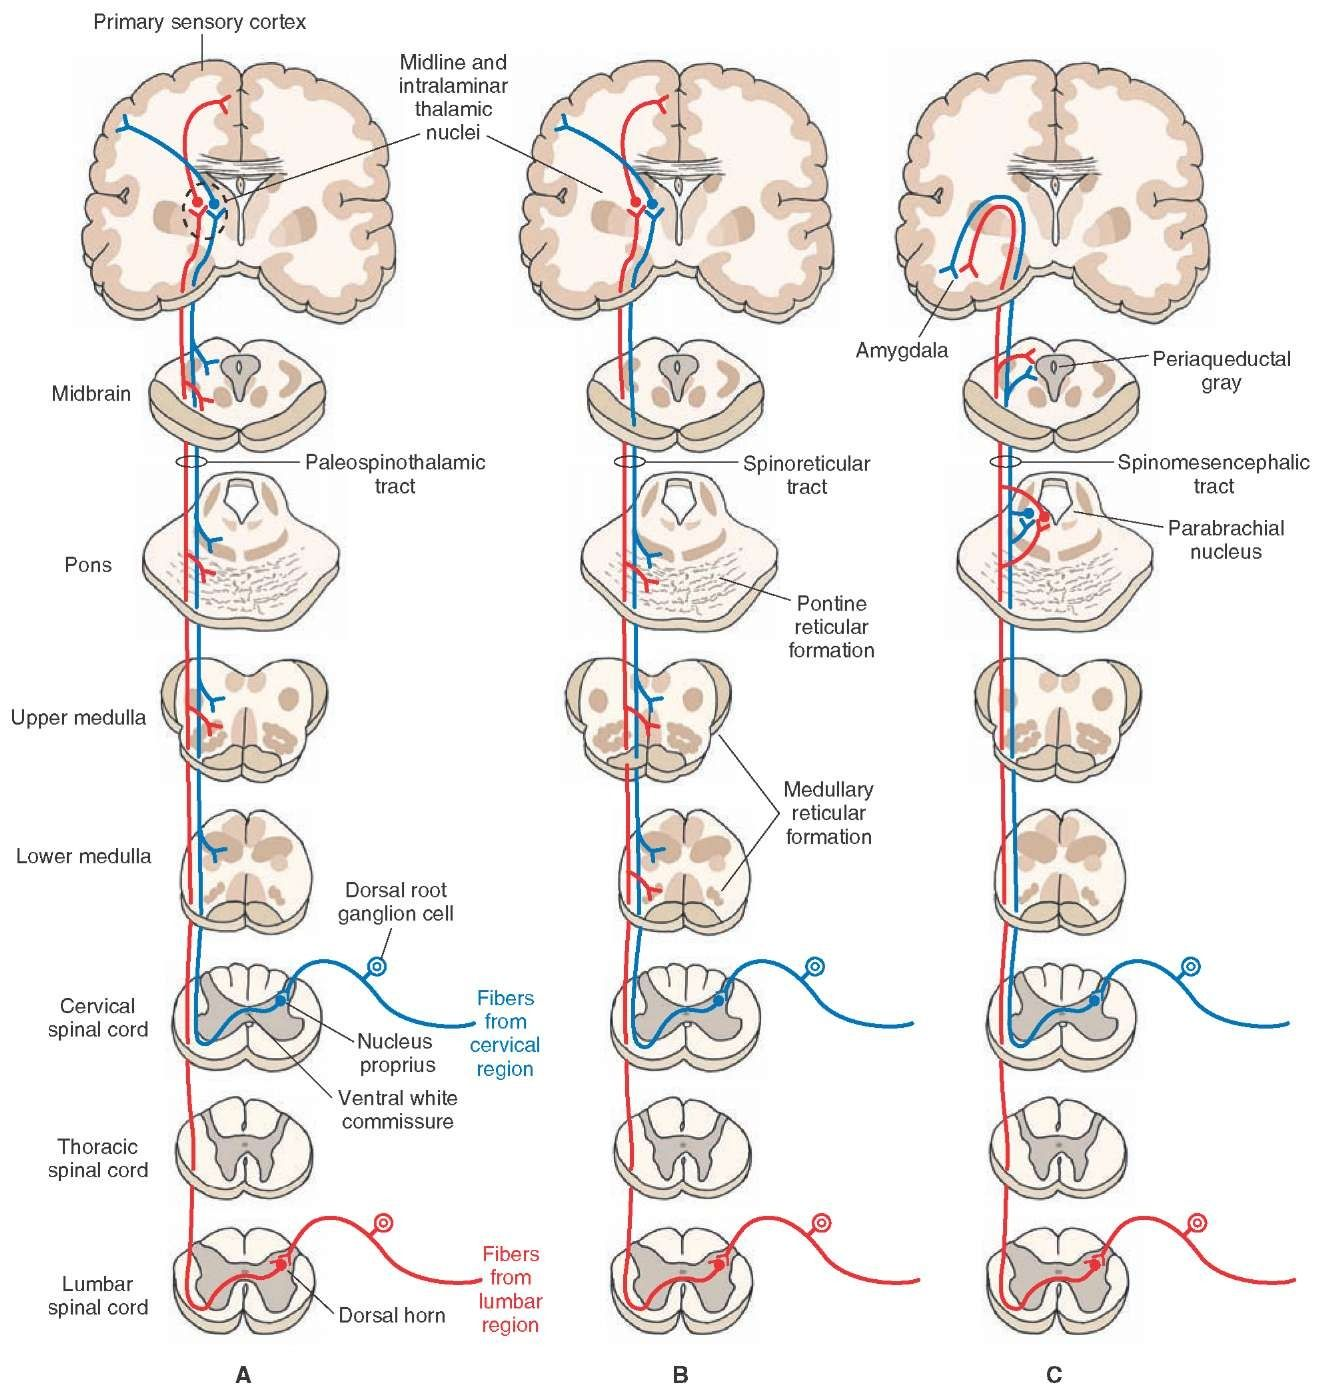 Indirect Spinothalamic Pathways